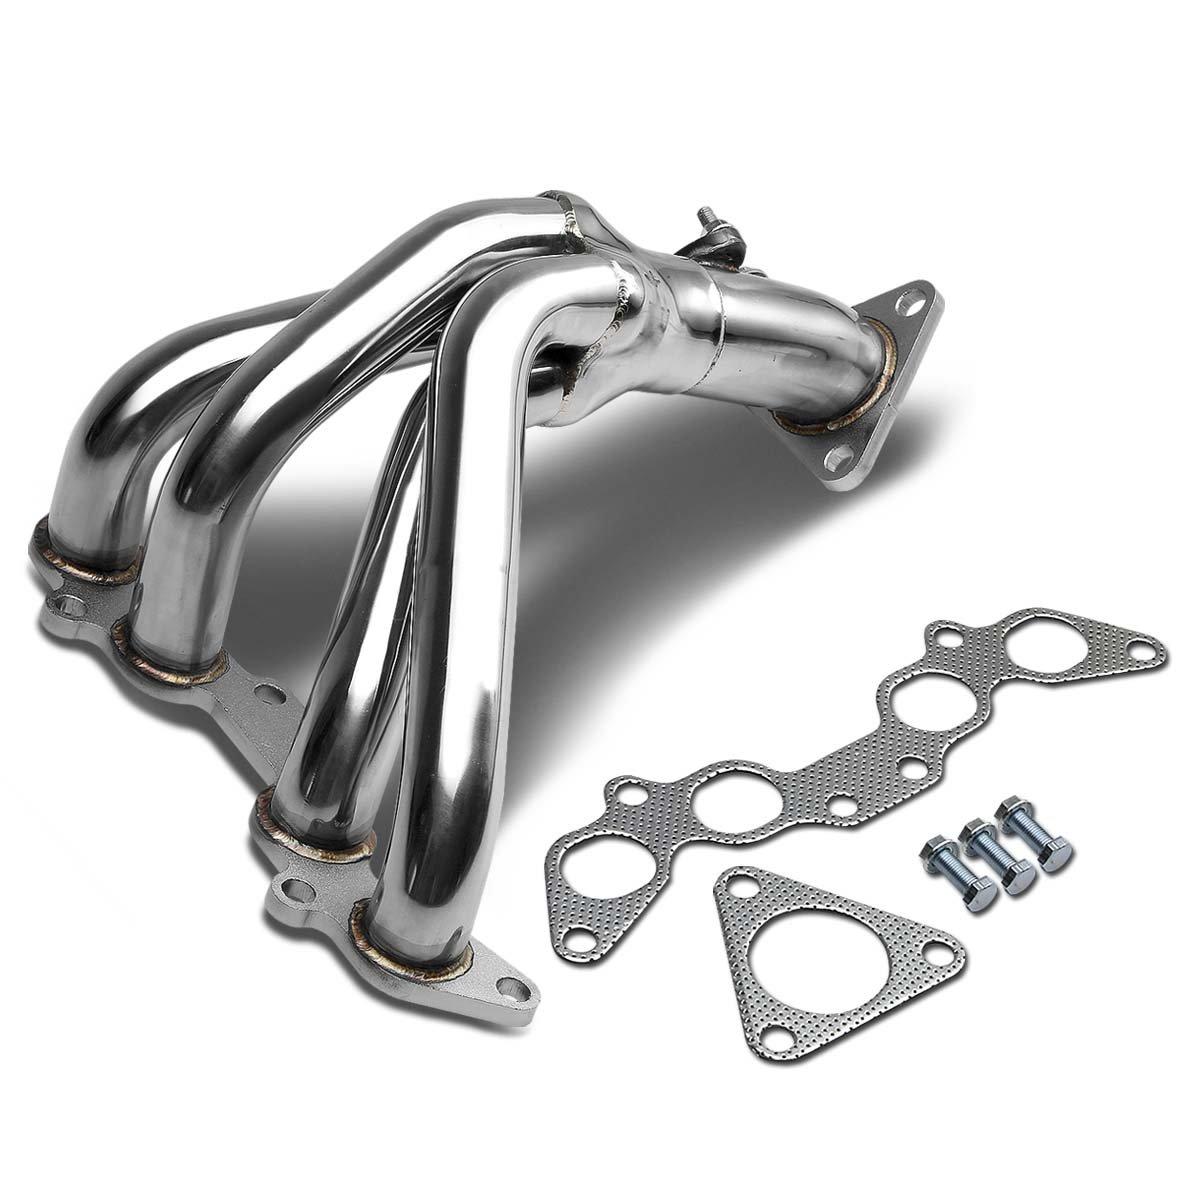 For Toyota Corolla High Performance 4-1 Design Stainless Steel Exhaust Header Kit E100